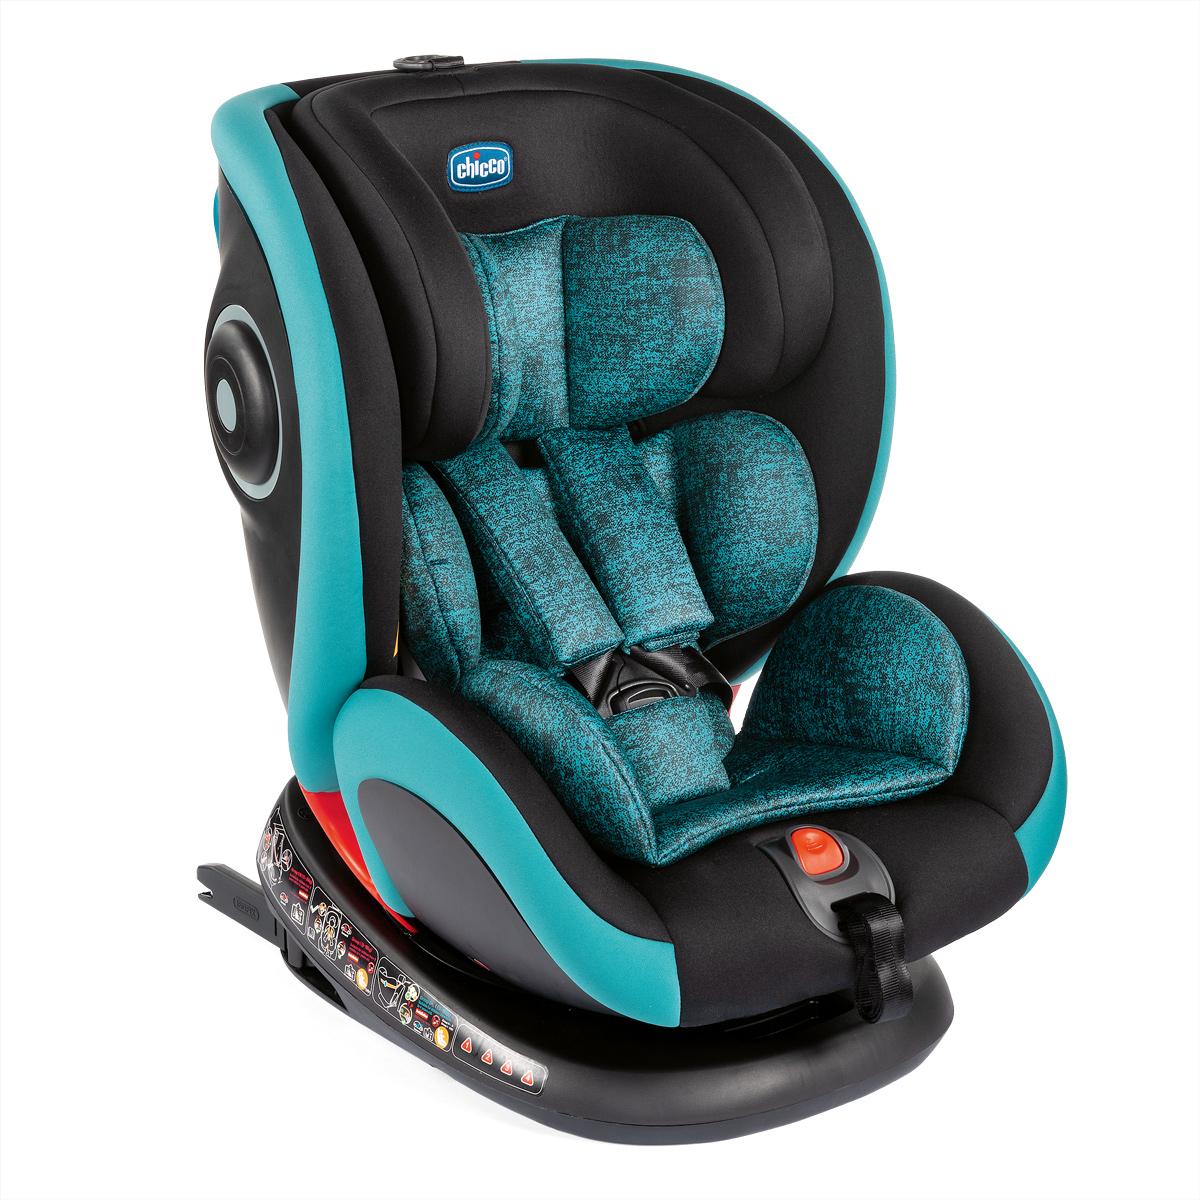 Scaun Auto Isofix Rotativ Chicco Seat4fix, Octane, Grupa 0+/1/2/3, 0-36kg